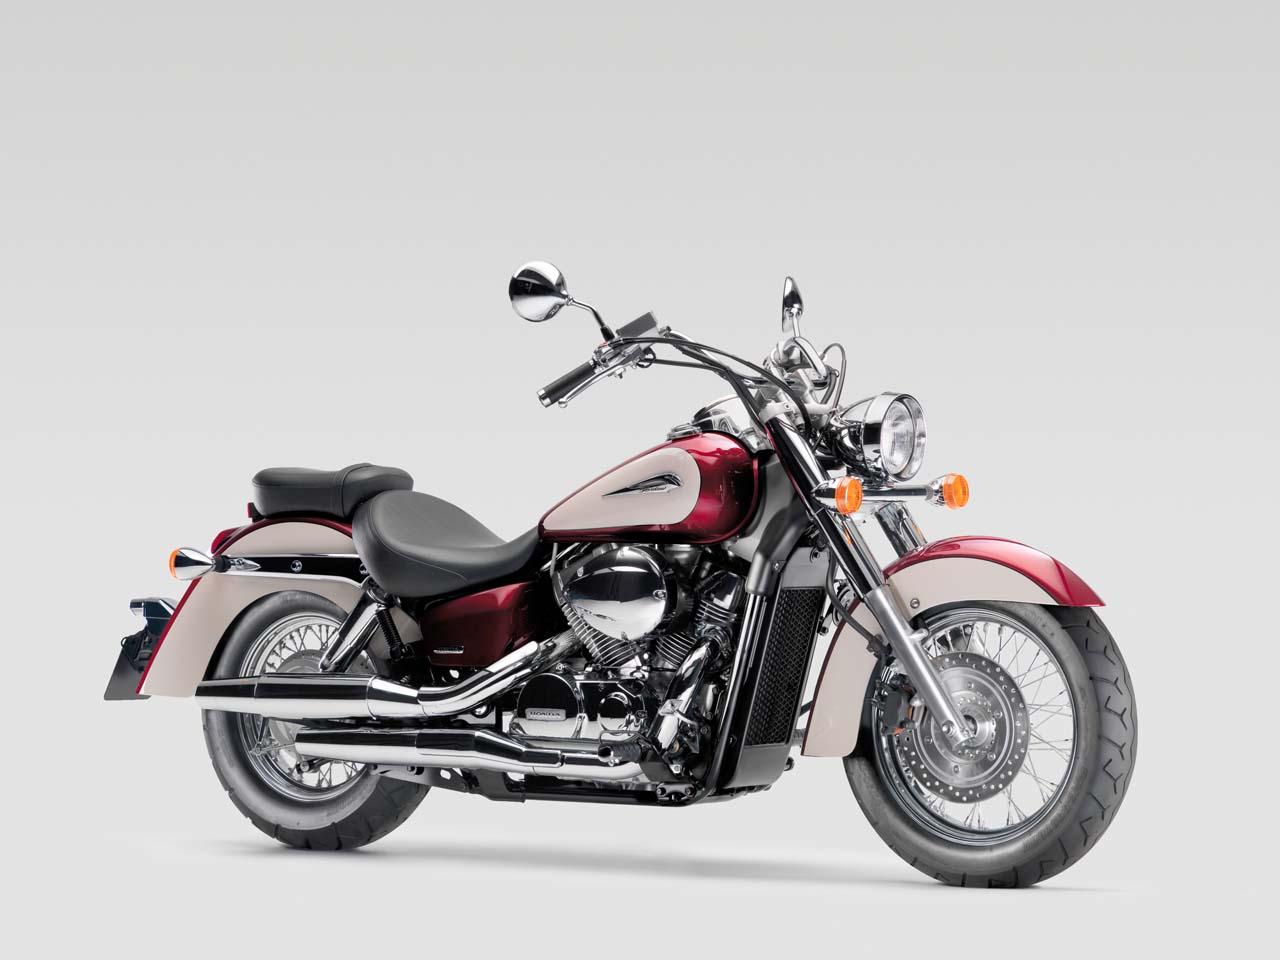 Moto occasion honda shadow 125